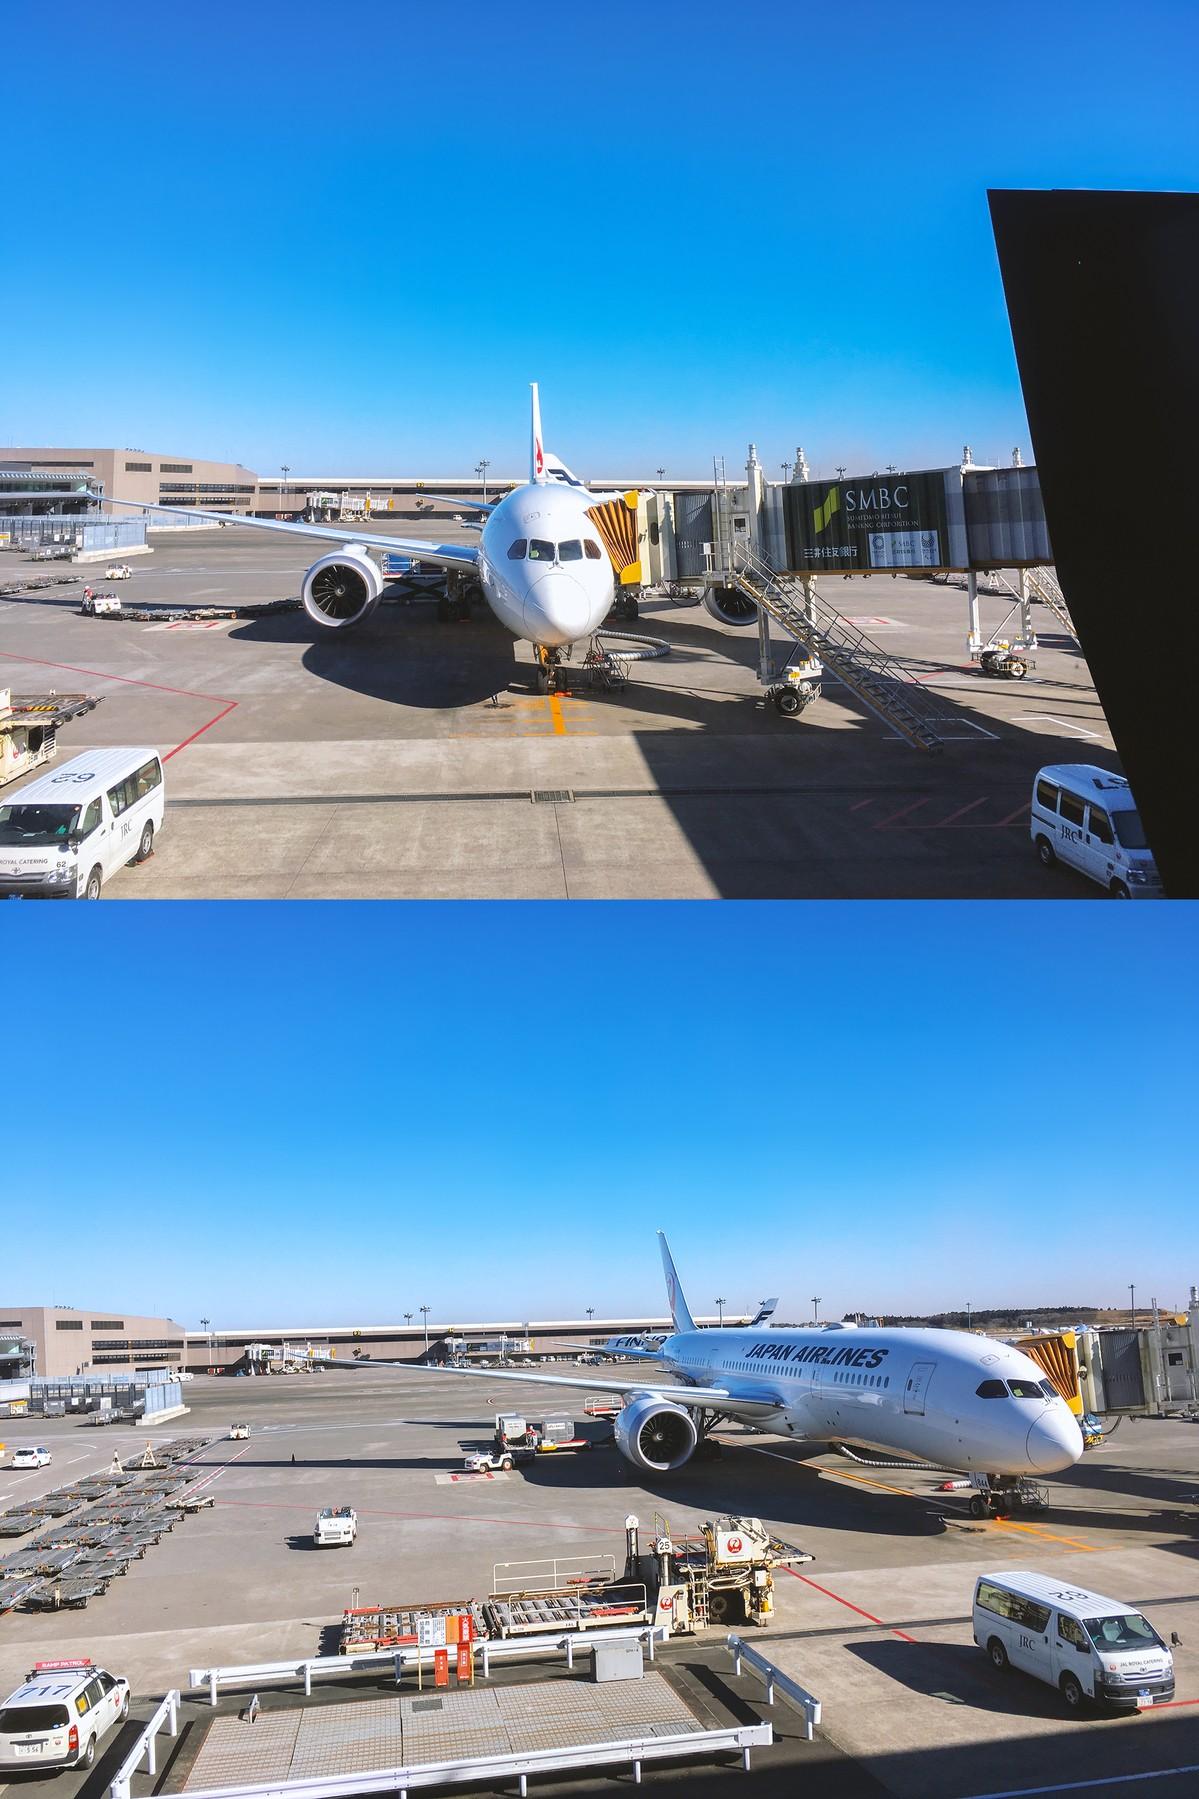 Re: [原创]【 寰球十万八千里 | 中集 | 耶路撒冷 】 BOEING 787-8 JA844J 日本东京成田机场